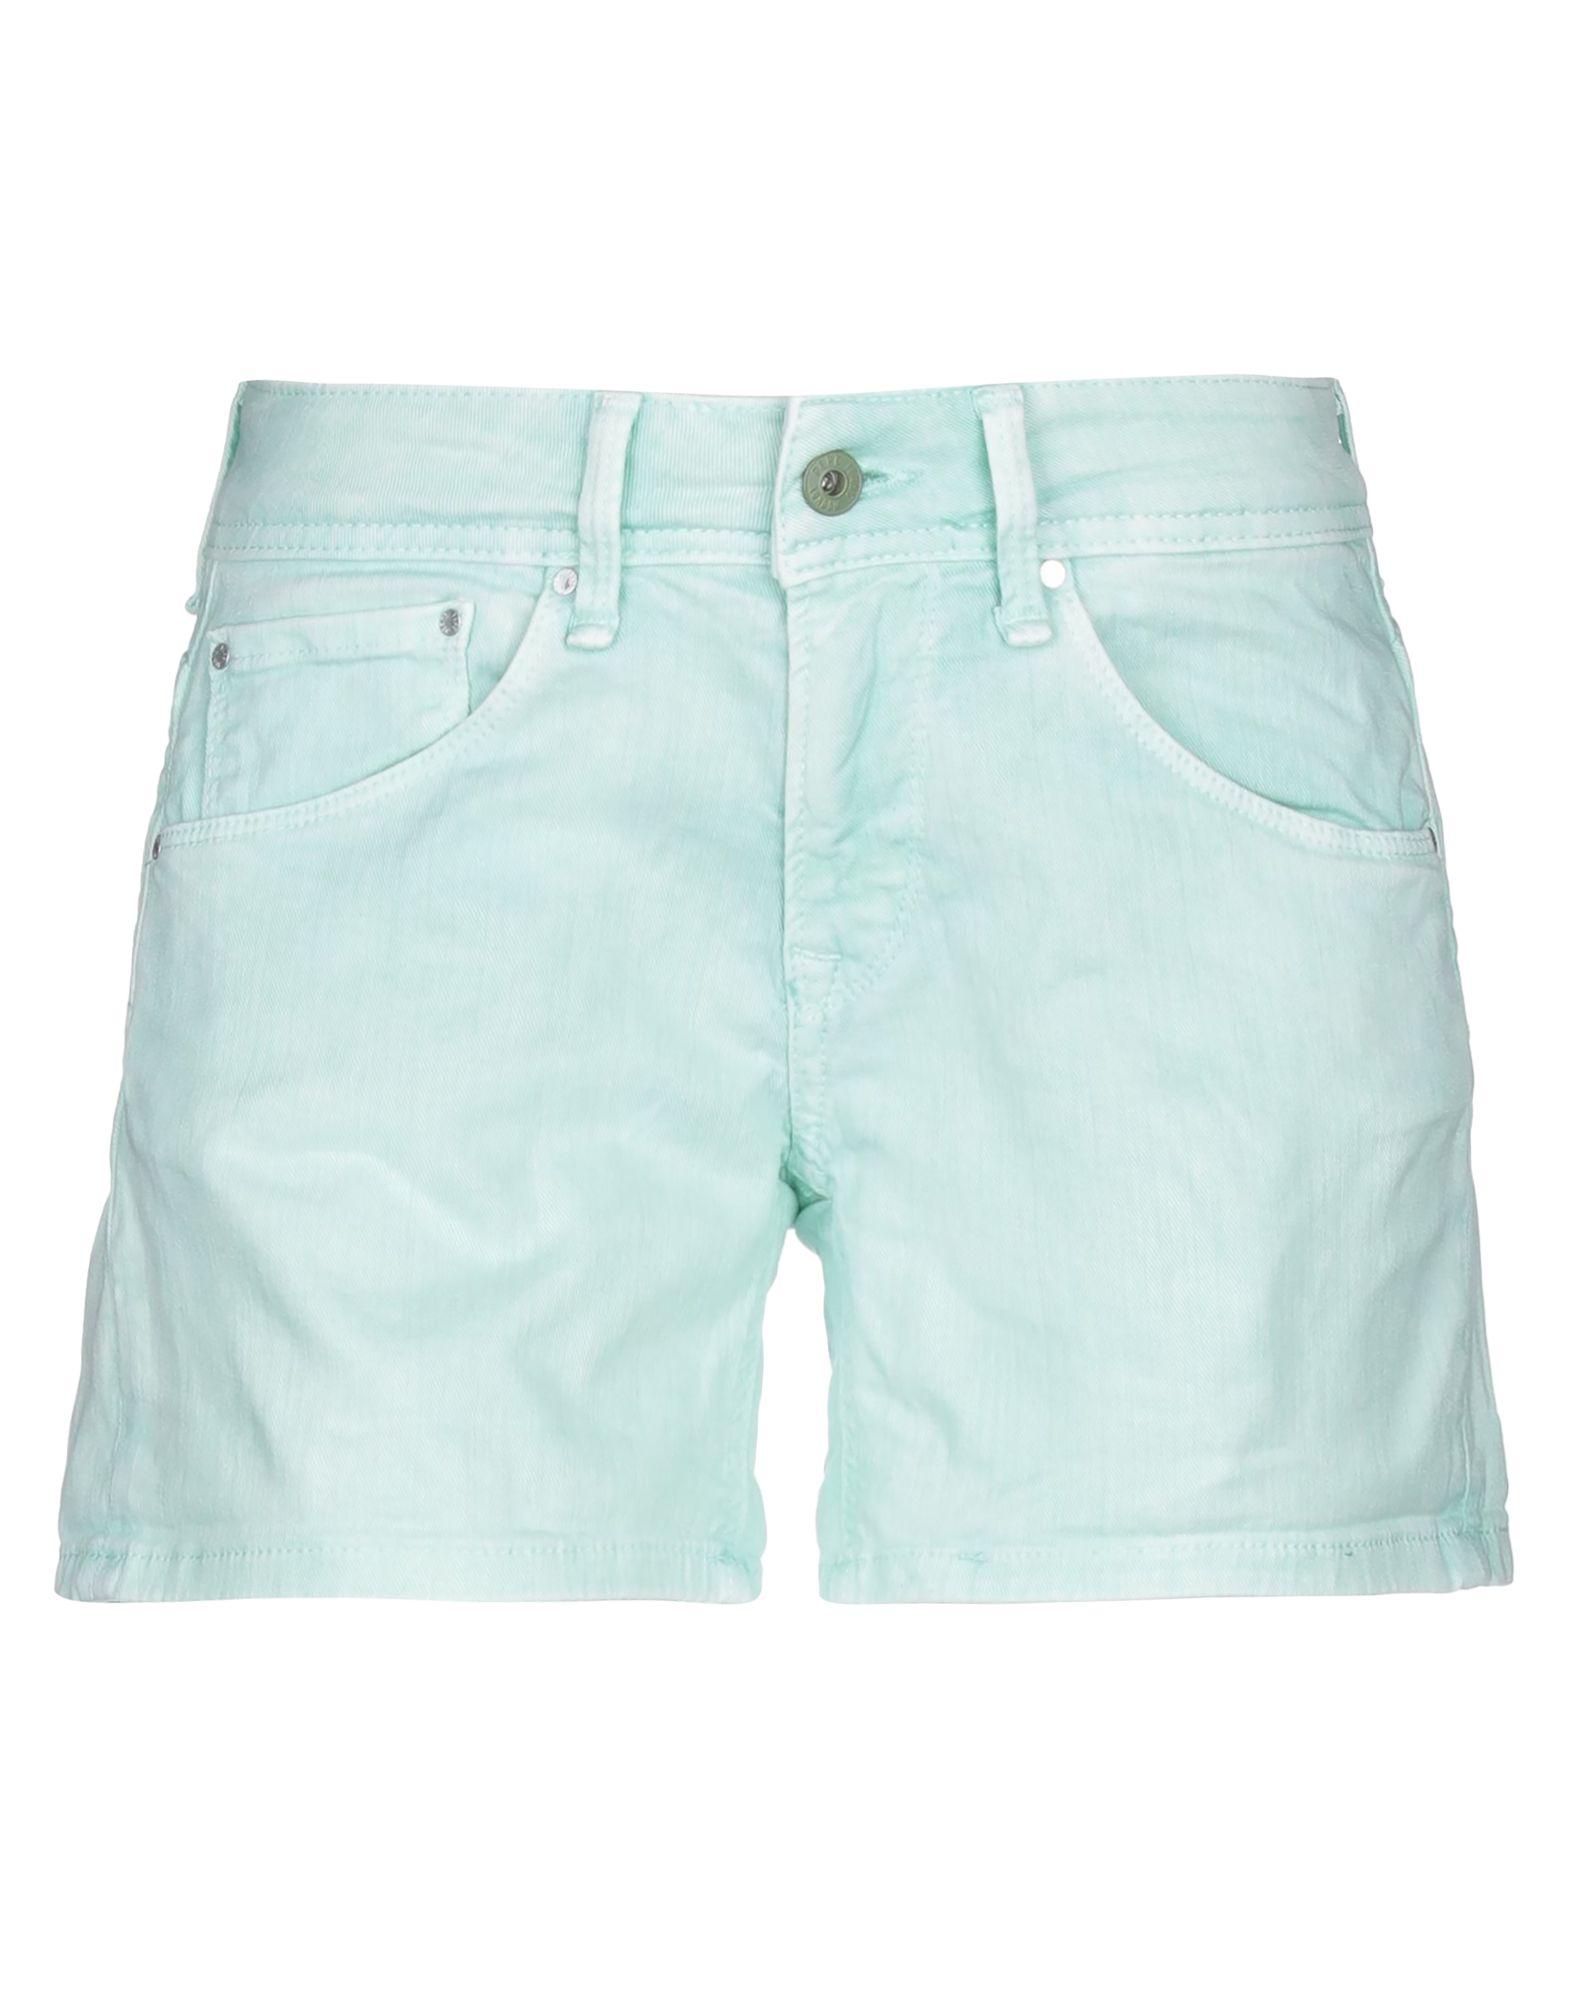 TRU-BLU by PEPE JEANS Джинсовые шорты pepe jeans джинсовые шорты